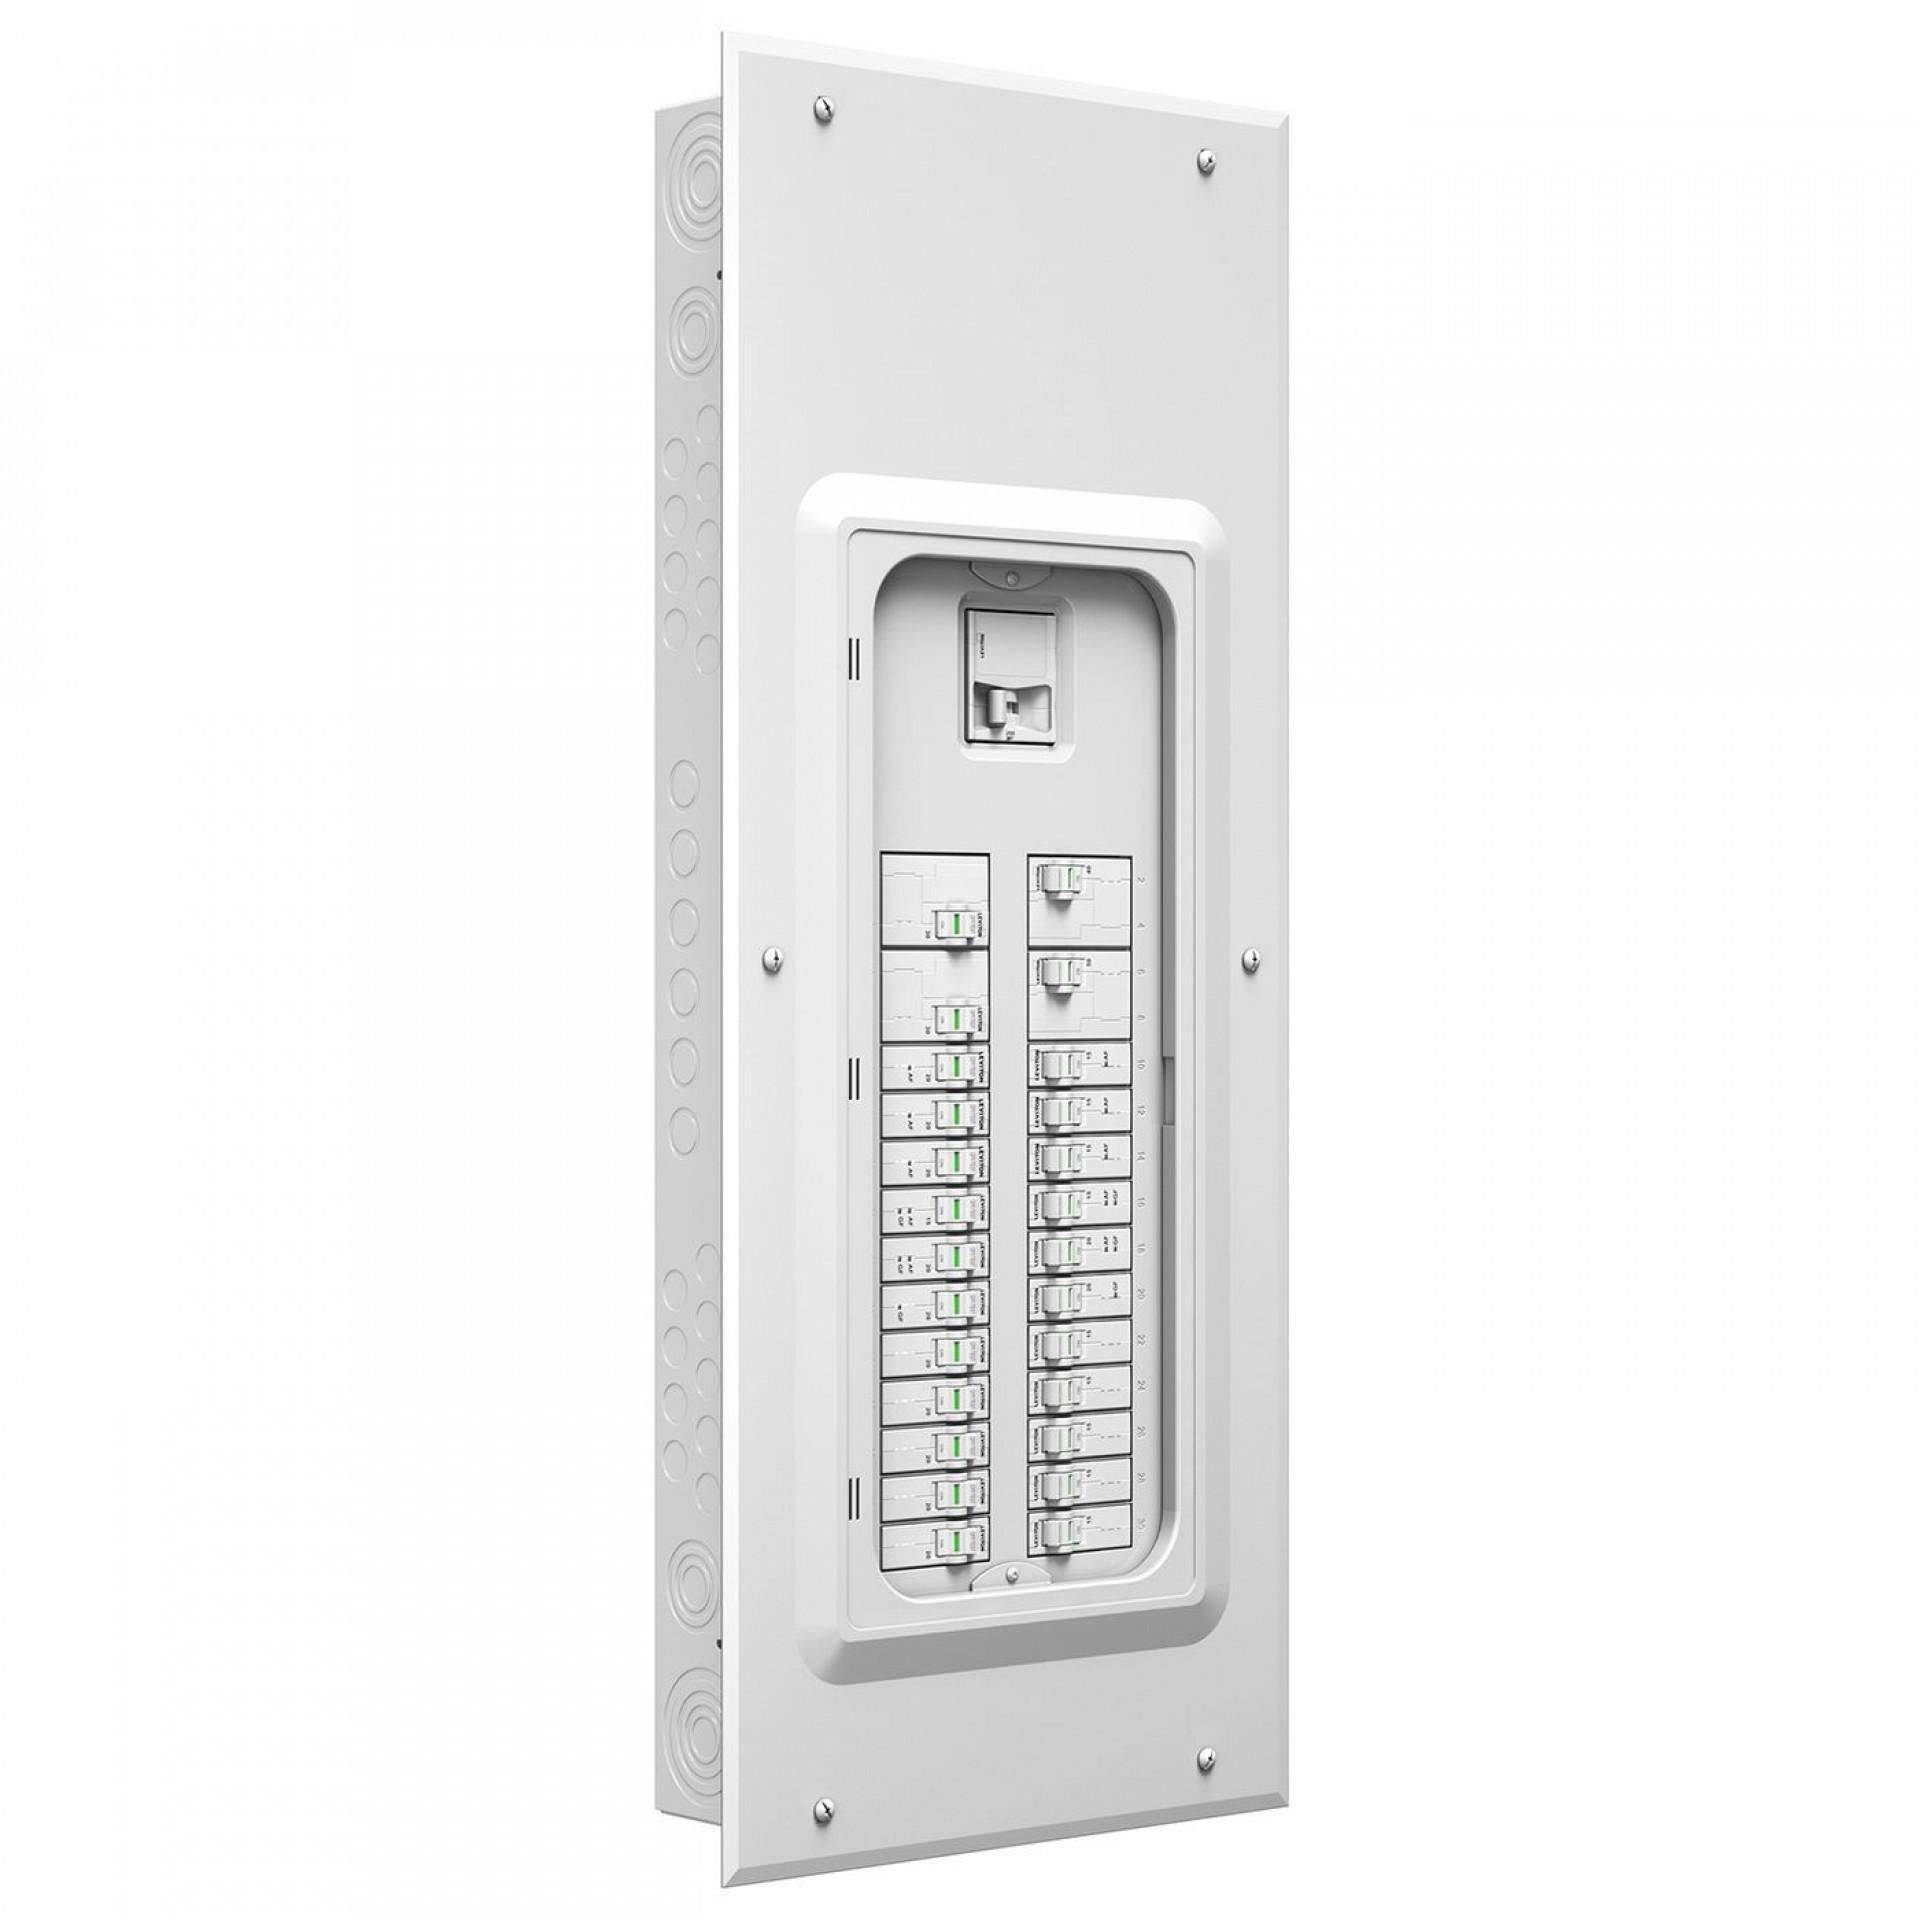 011 Fearsome Electrical Panel Label Template Idea  Siemen Free Excel1920